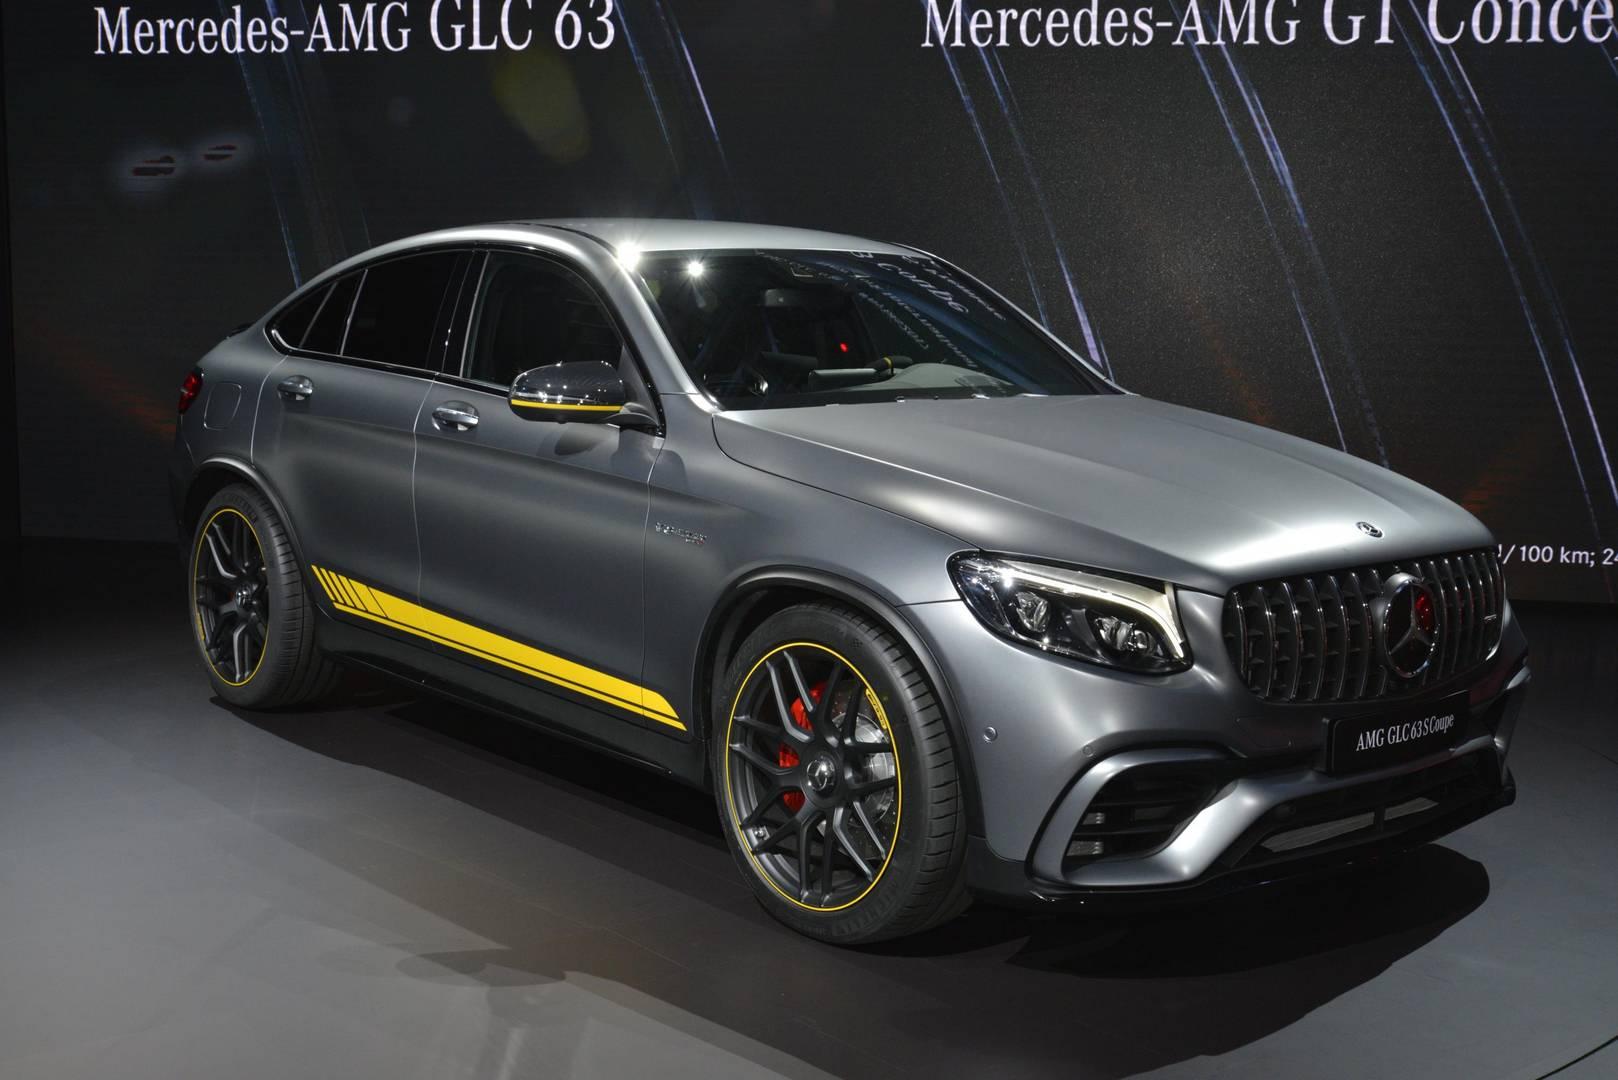 New York 2017 Mercedes Amg Glc 63